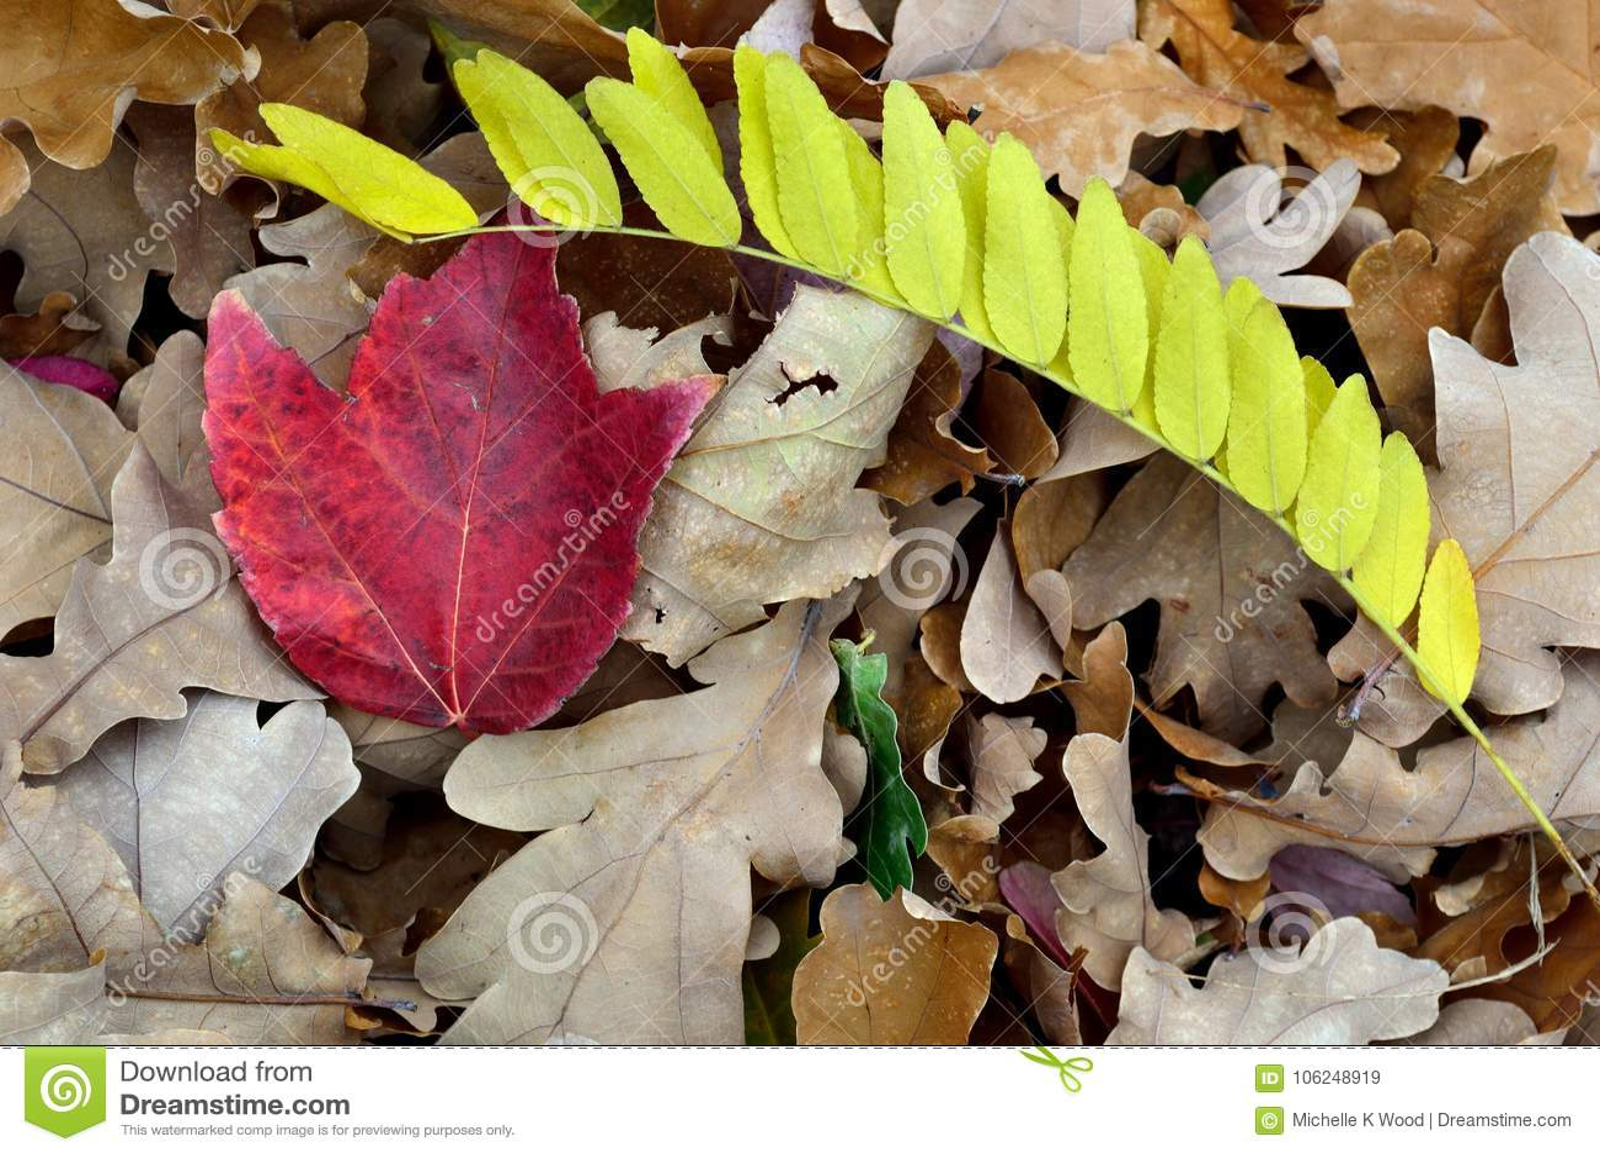 Fall Leaves White Oak Red Maple Locust